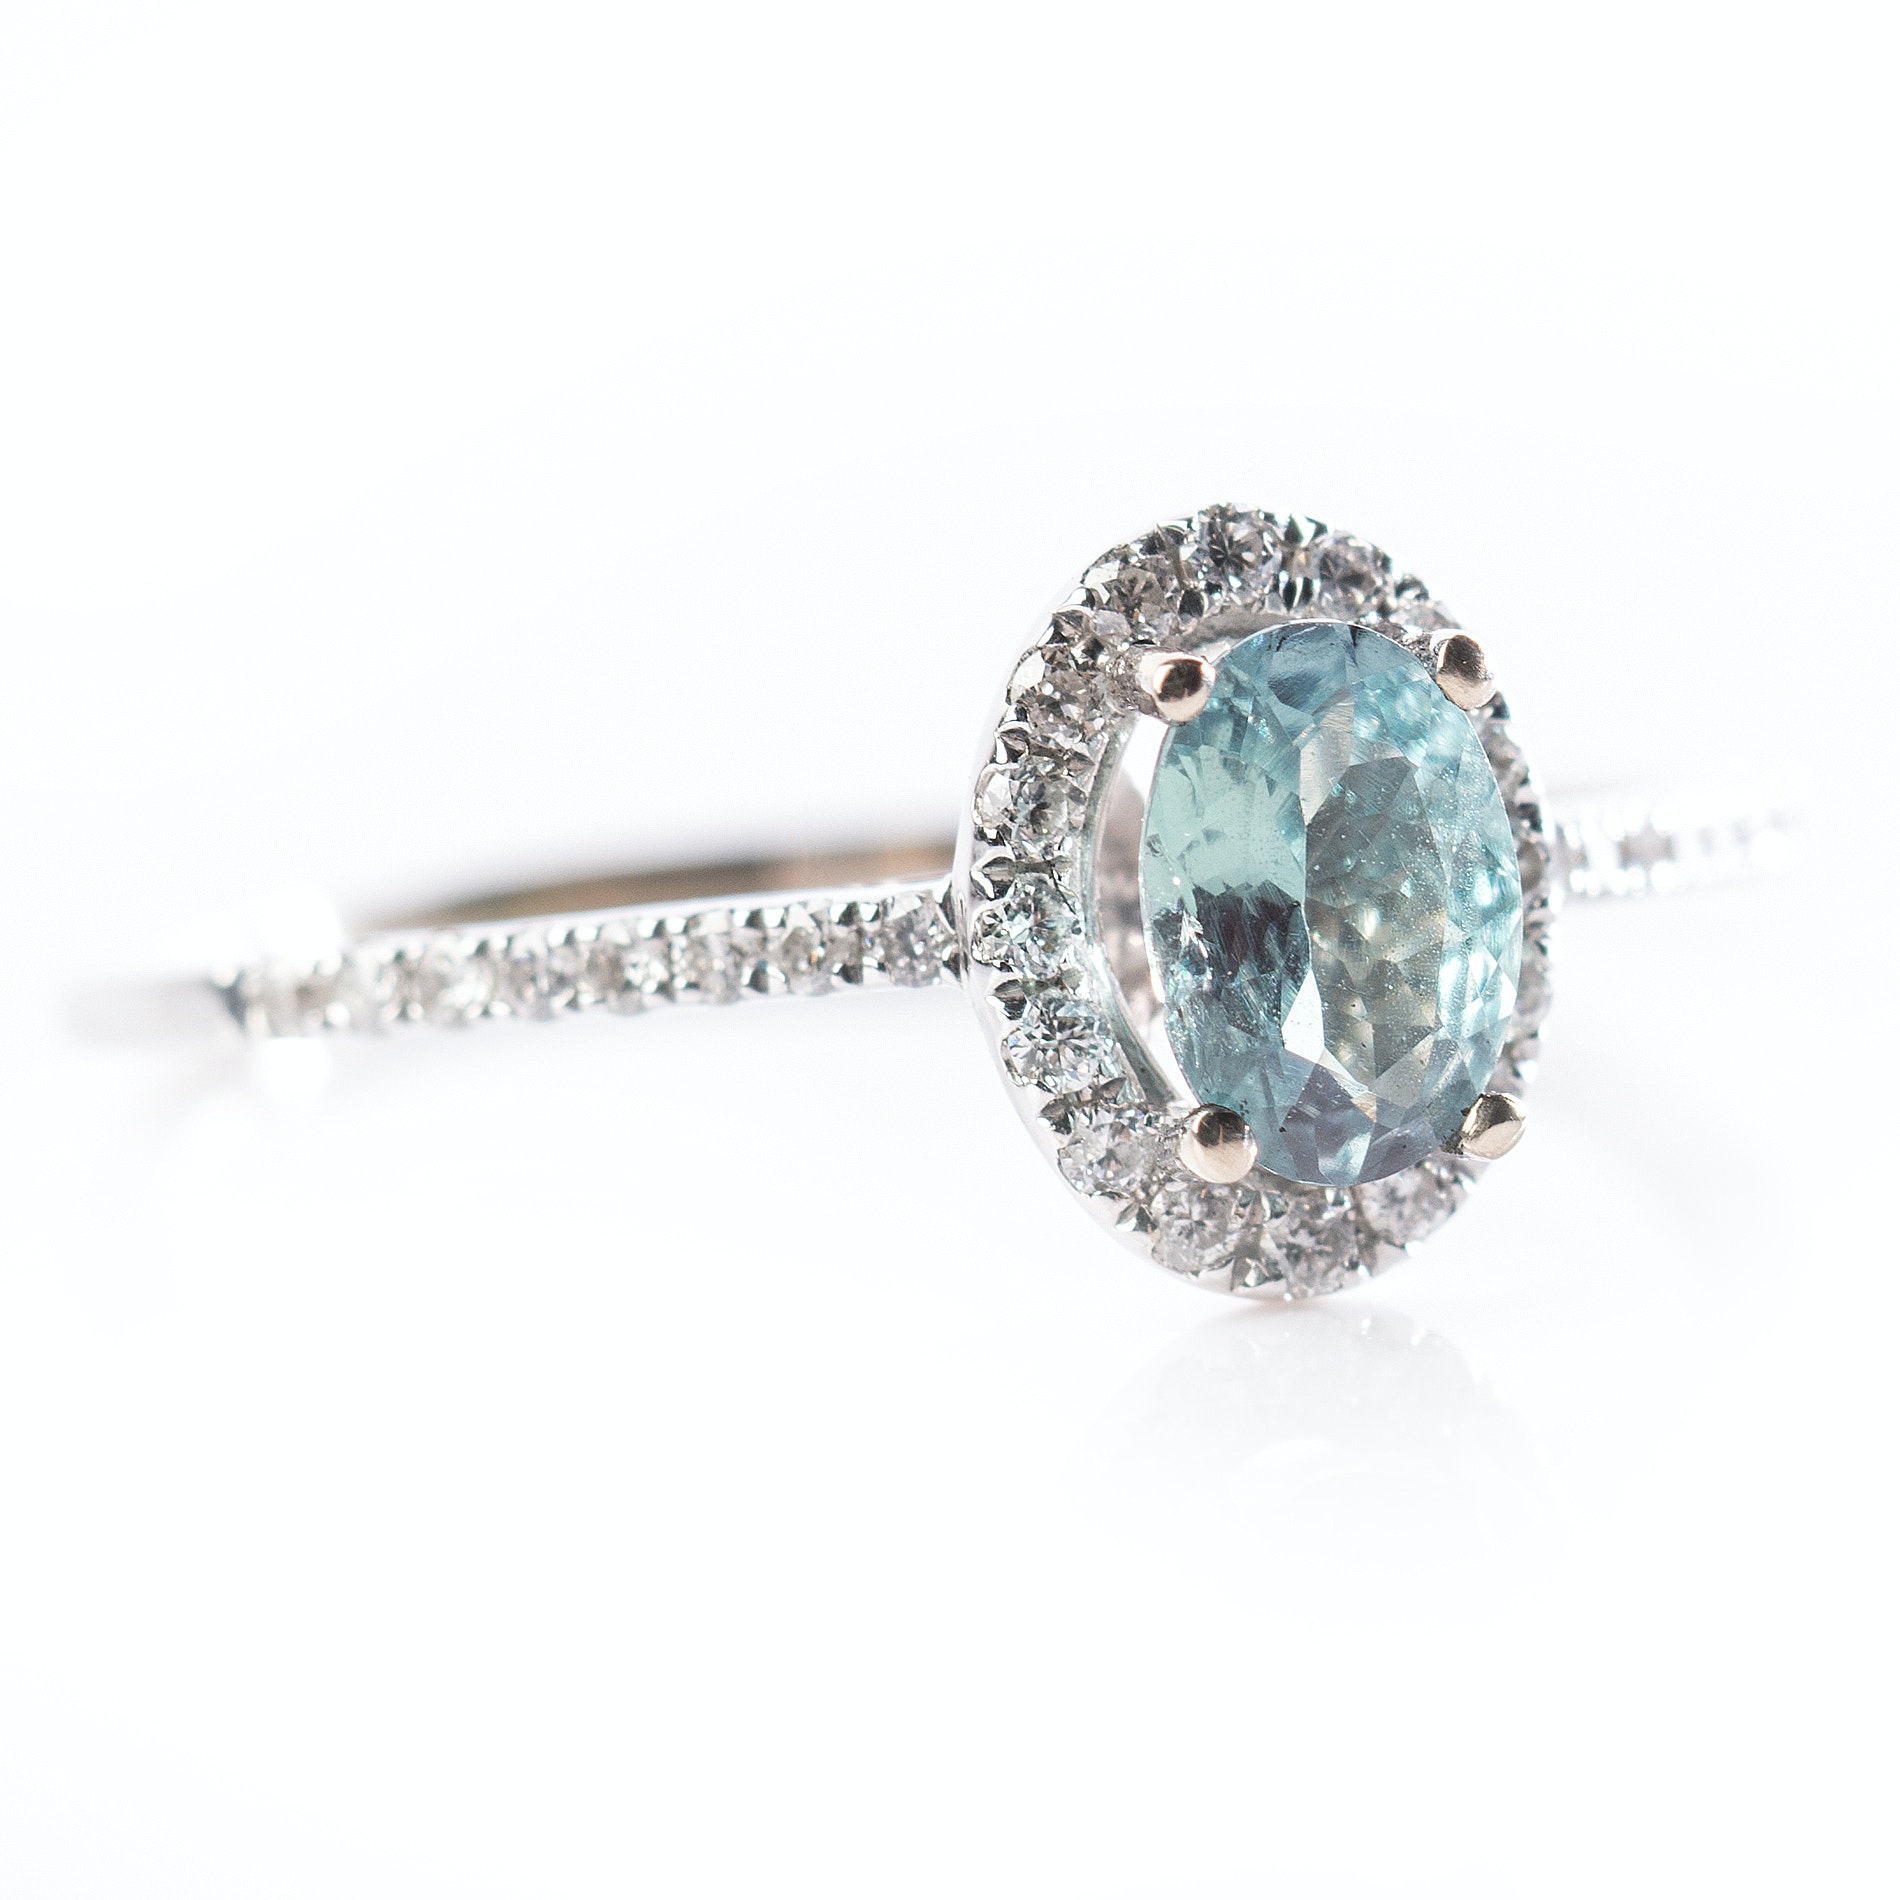 18K White Gold Alexandrite and Diamond Halo Ring